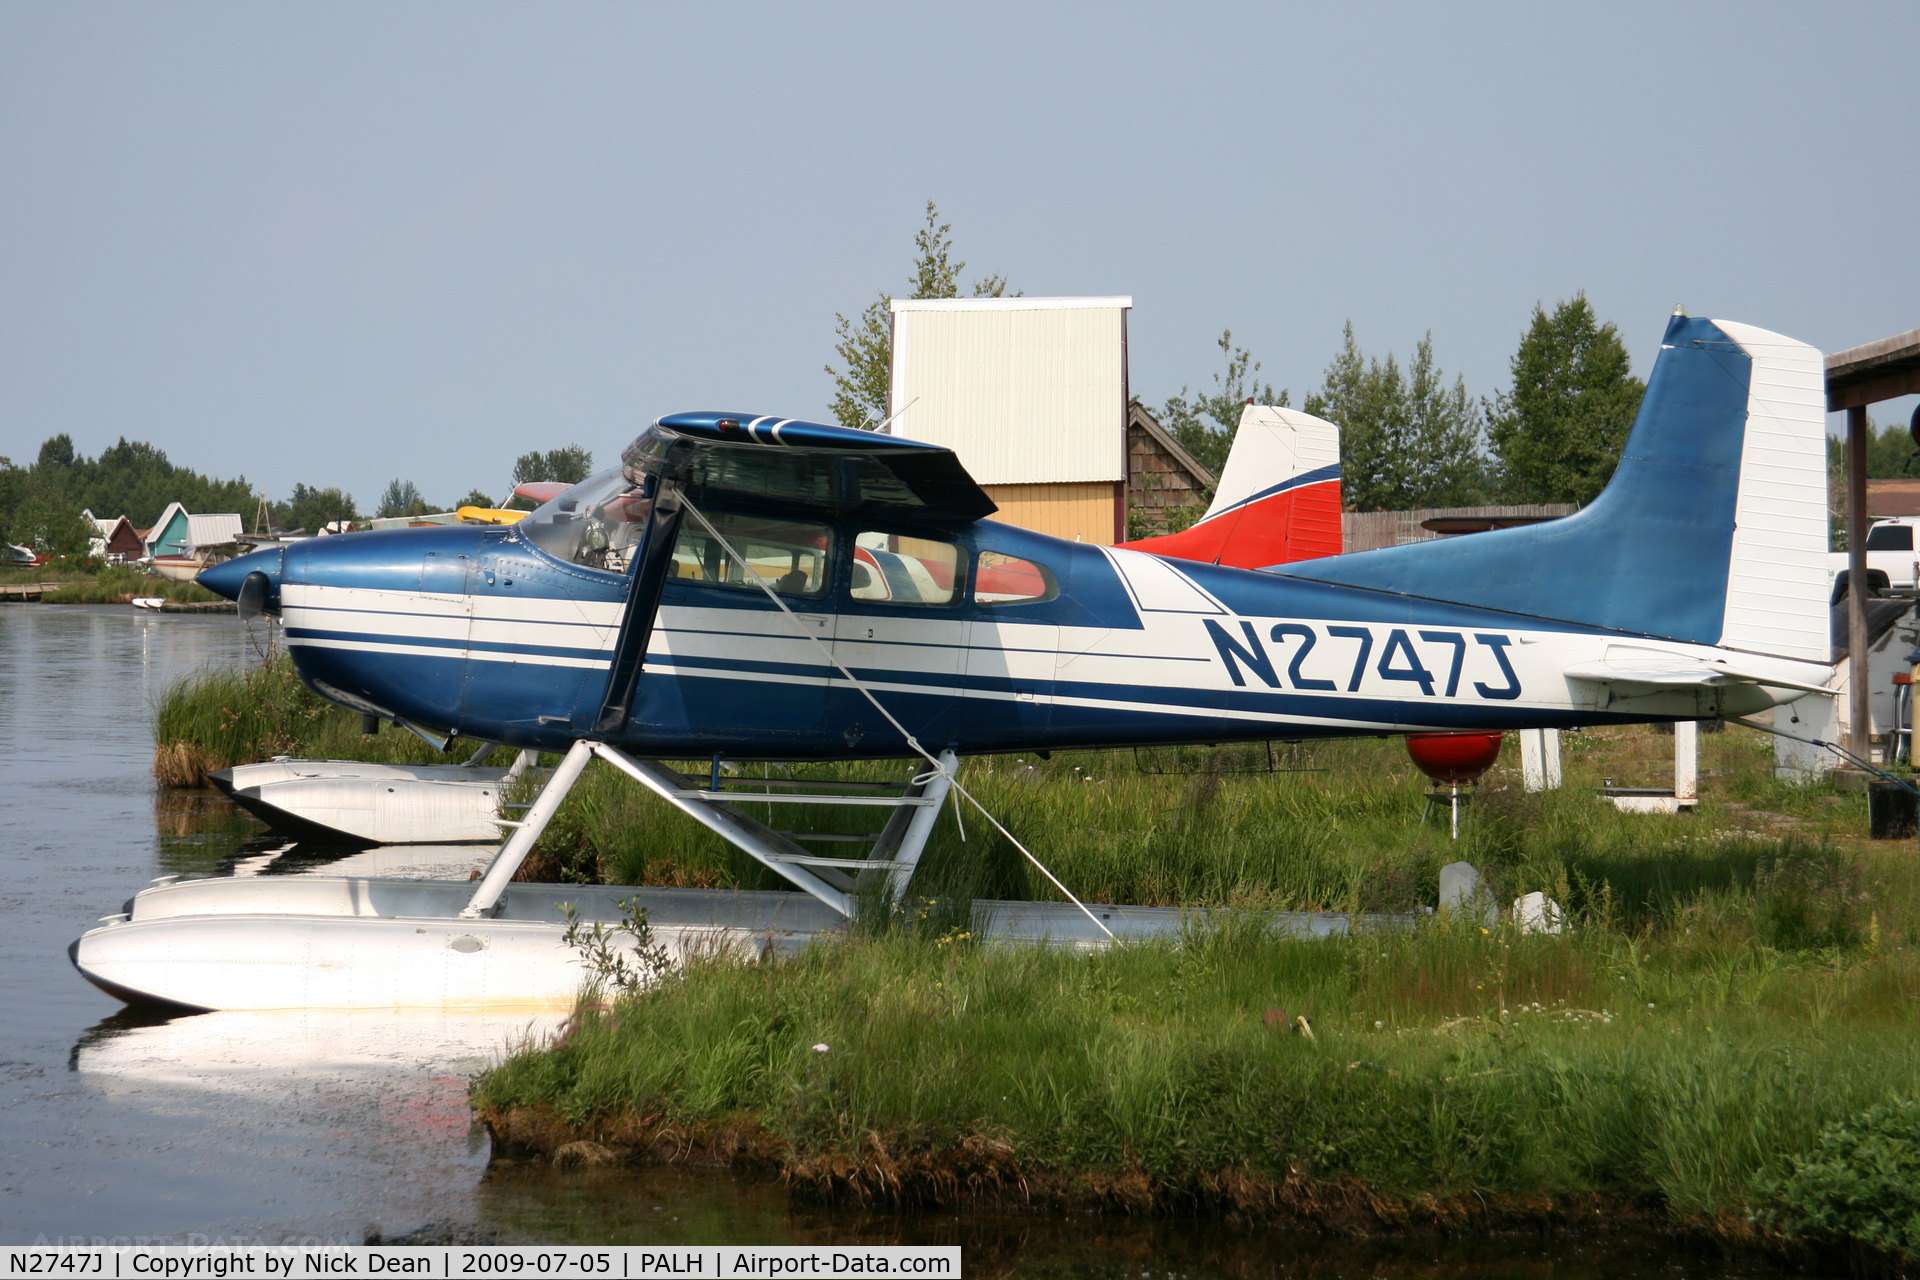 N2747J, 1969 Cessna A185E Skywagon 185 C/N 185-1497, PALH